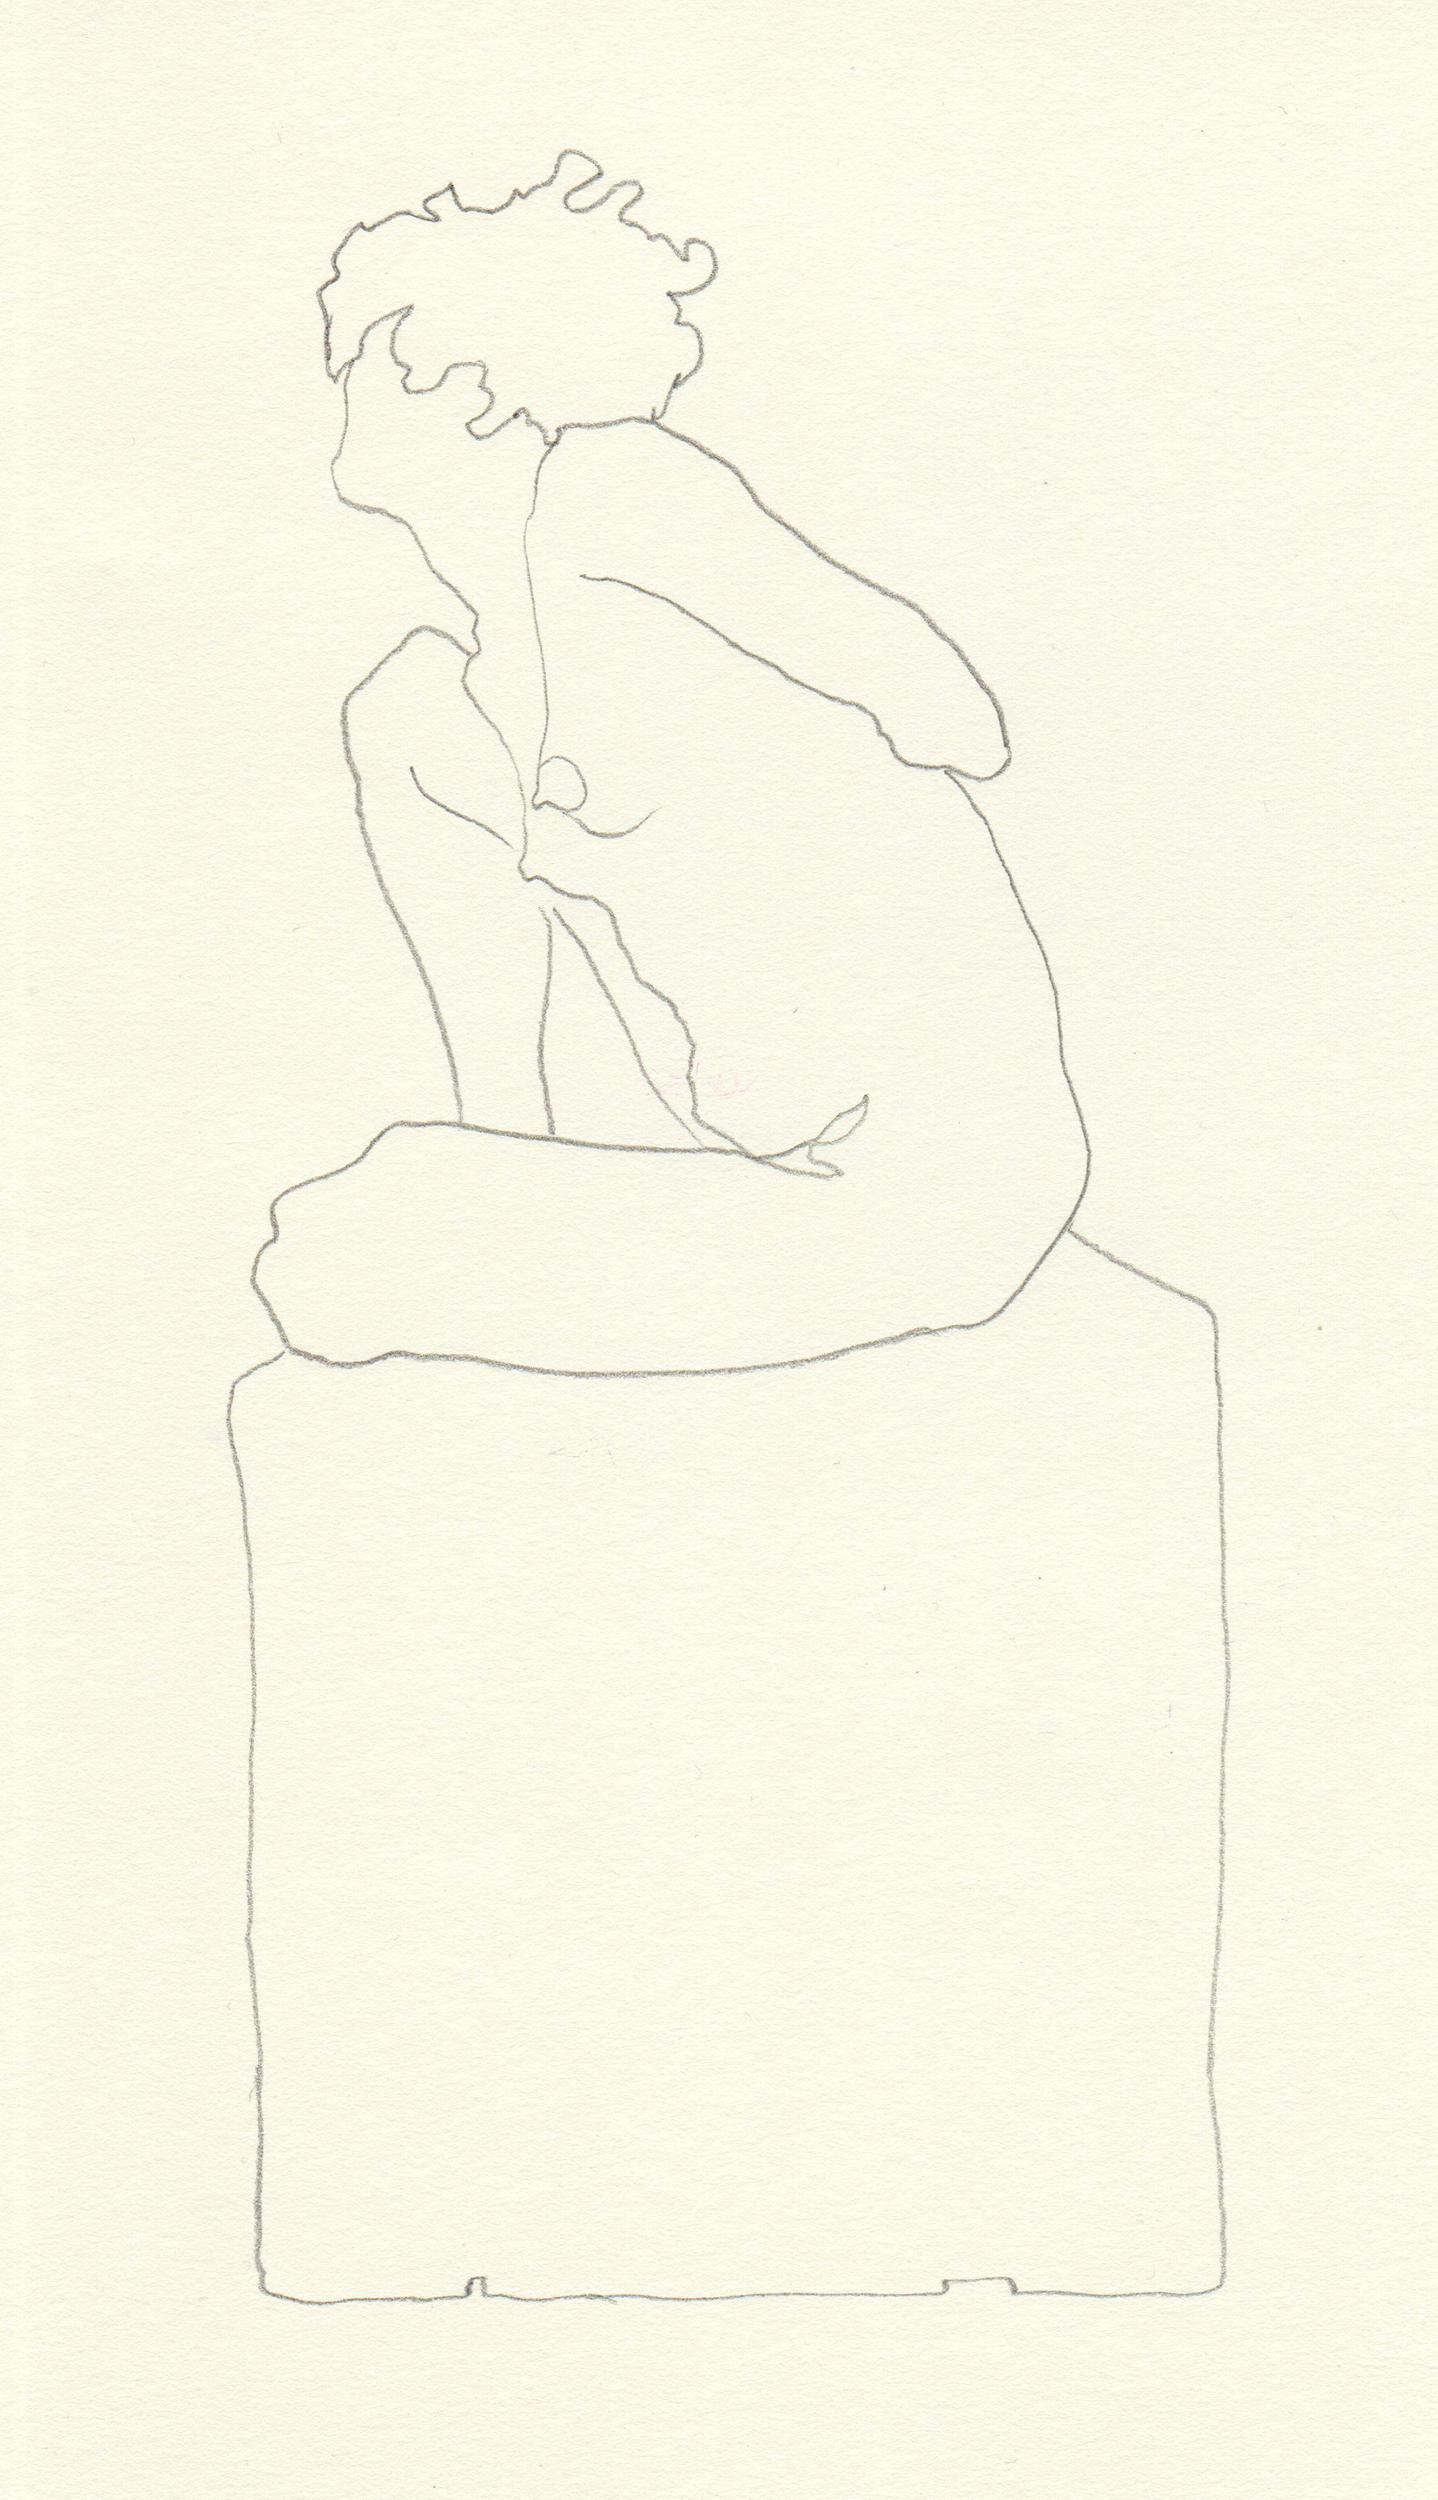 2012_Sketch_F-Beudin_036